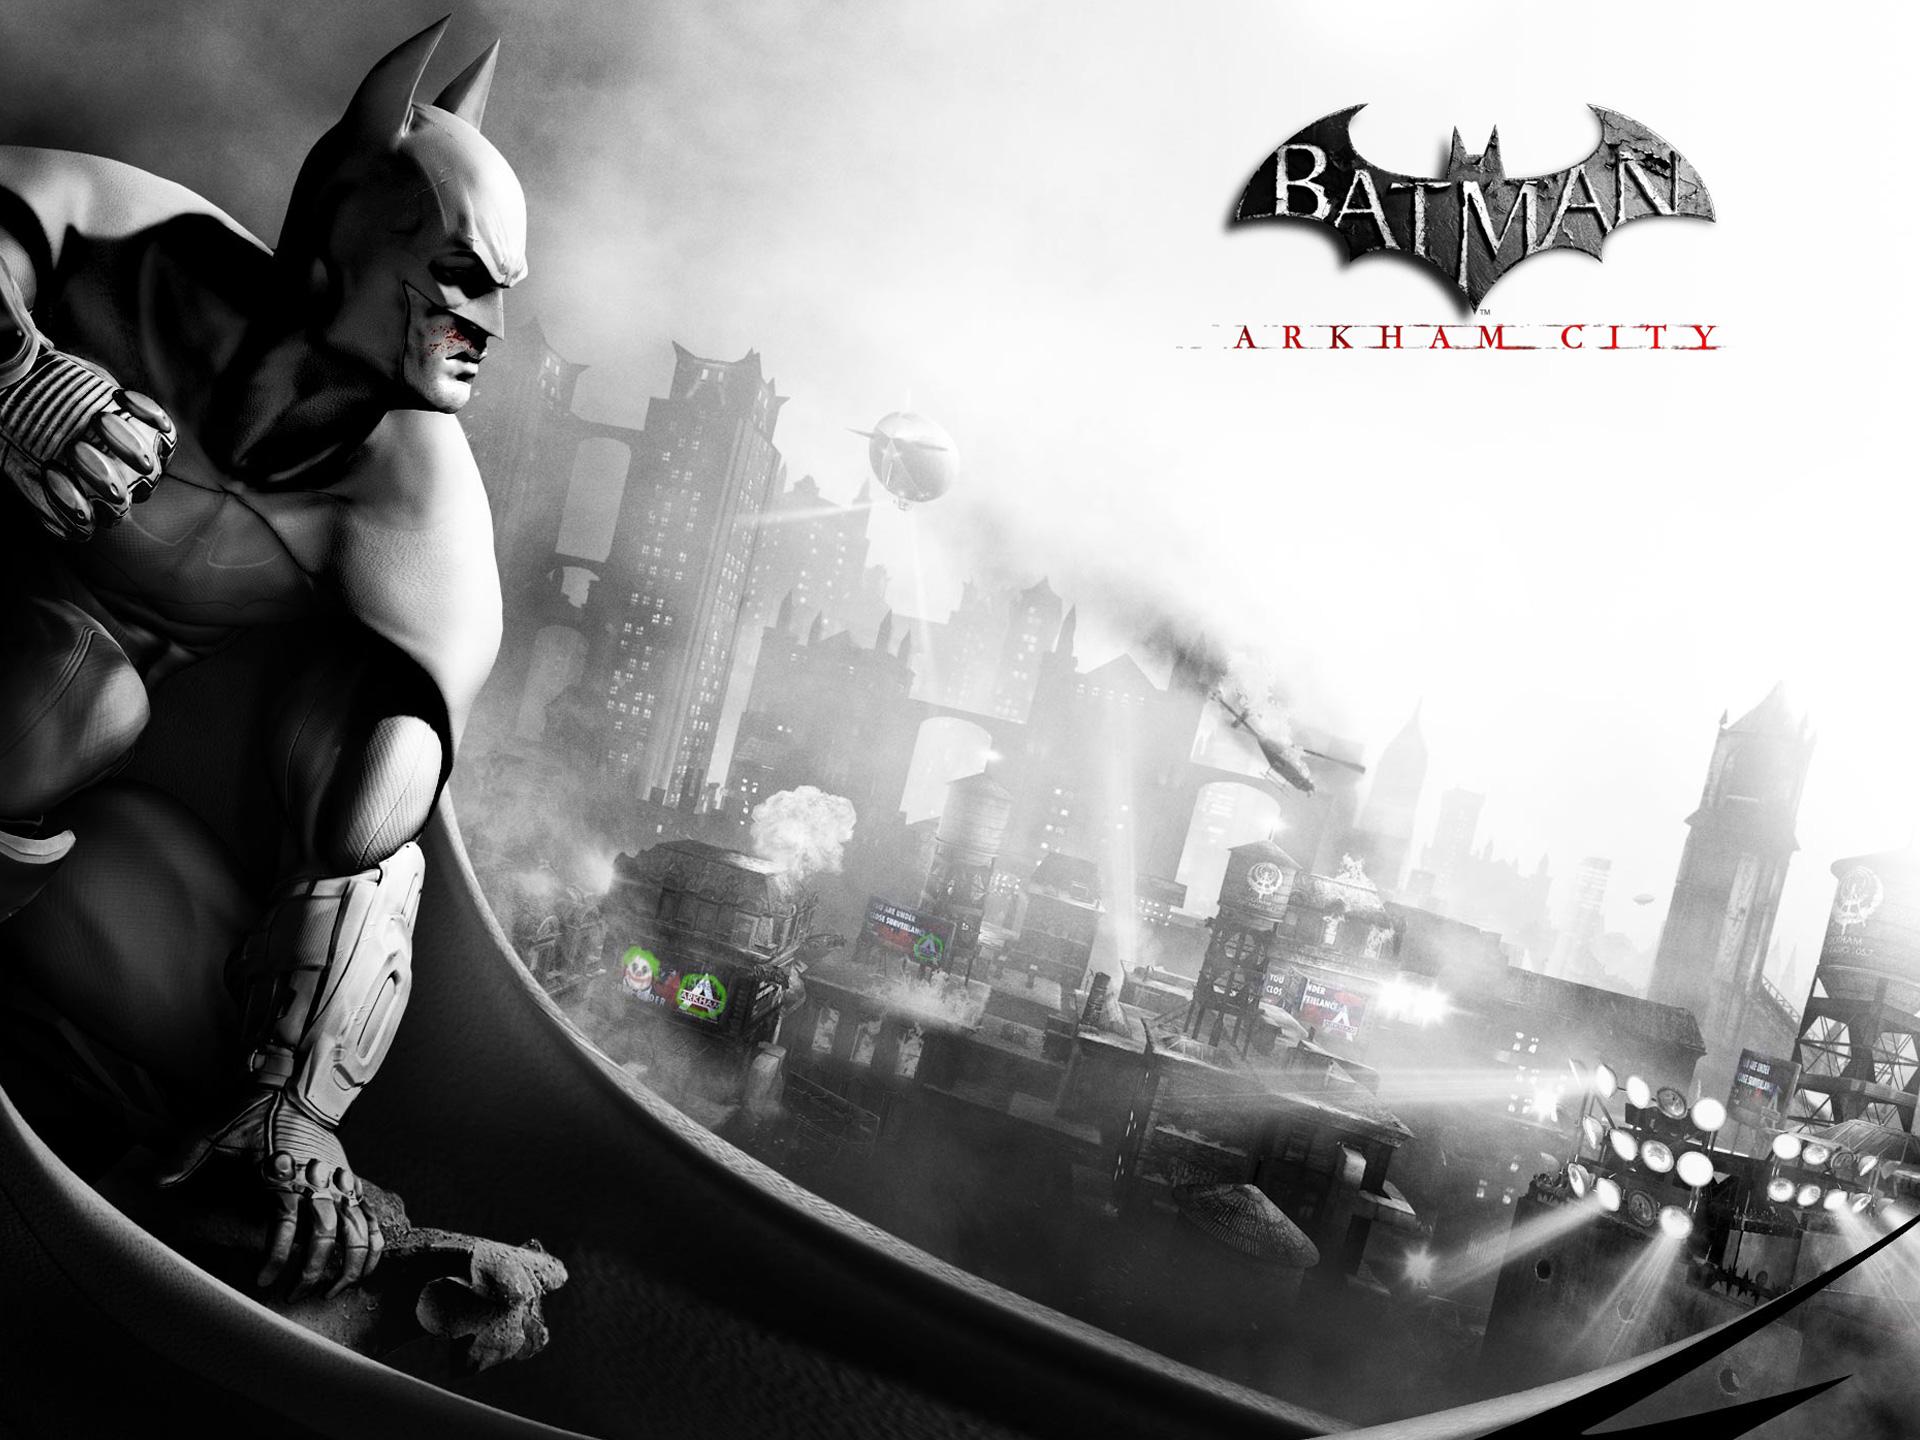 Batman Arkham City 2011 Game Wallpapers HD Wallpapers 1920x1440